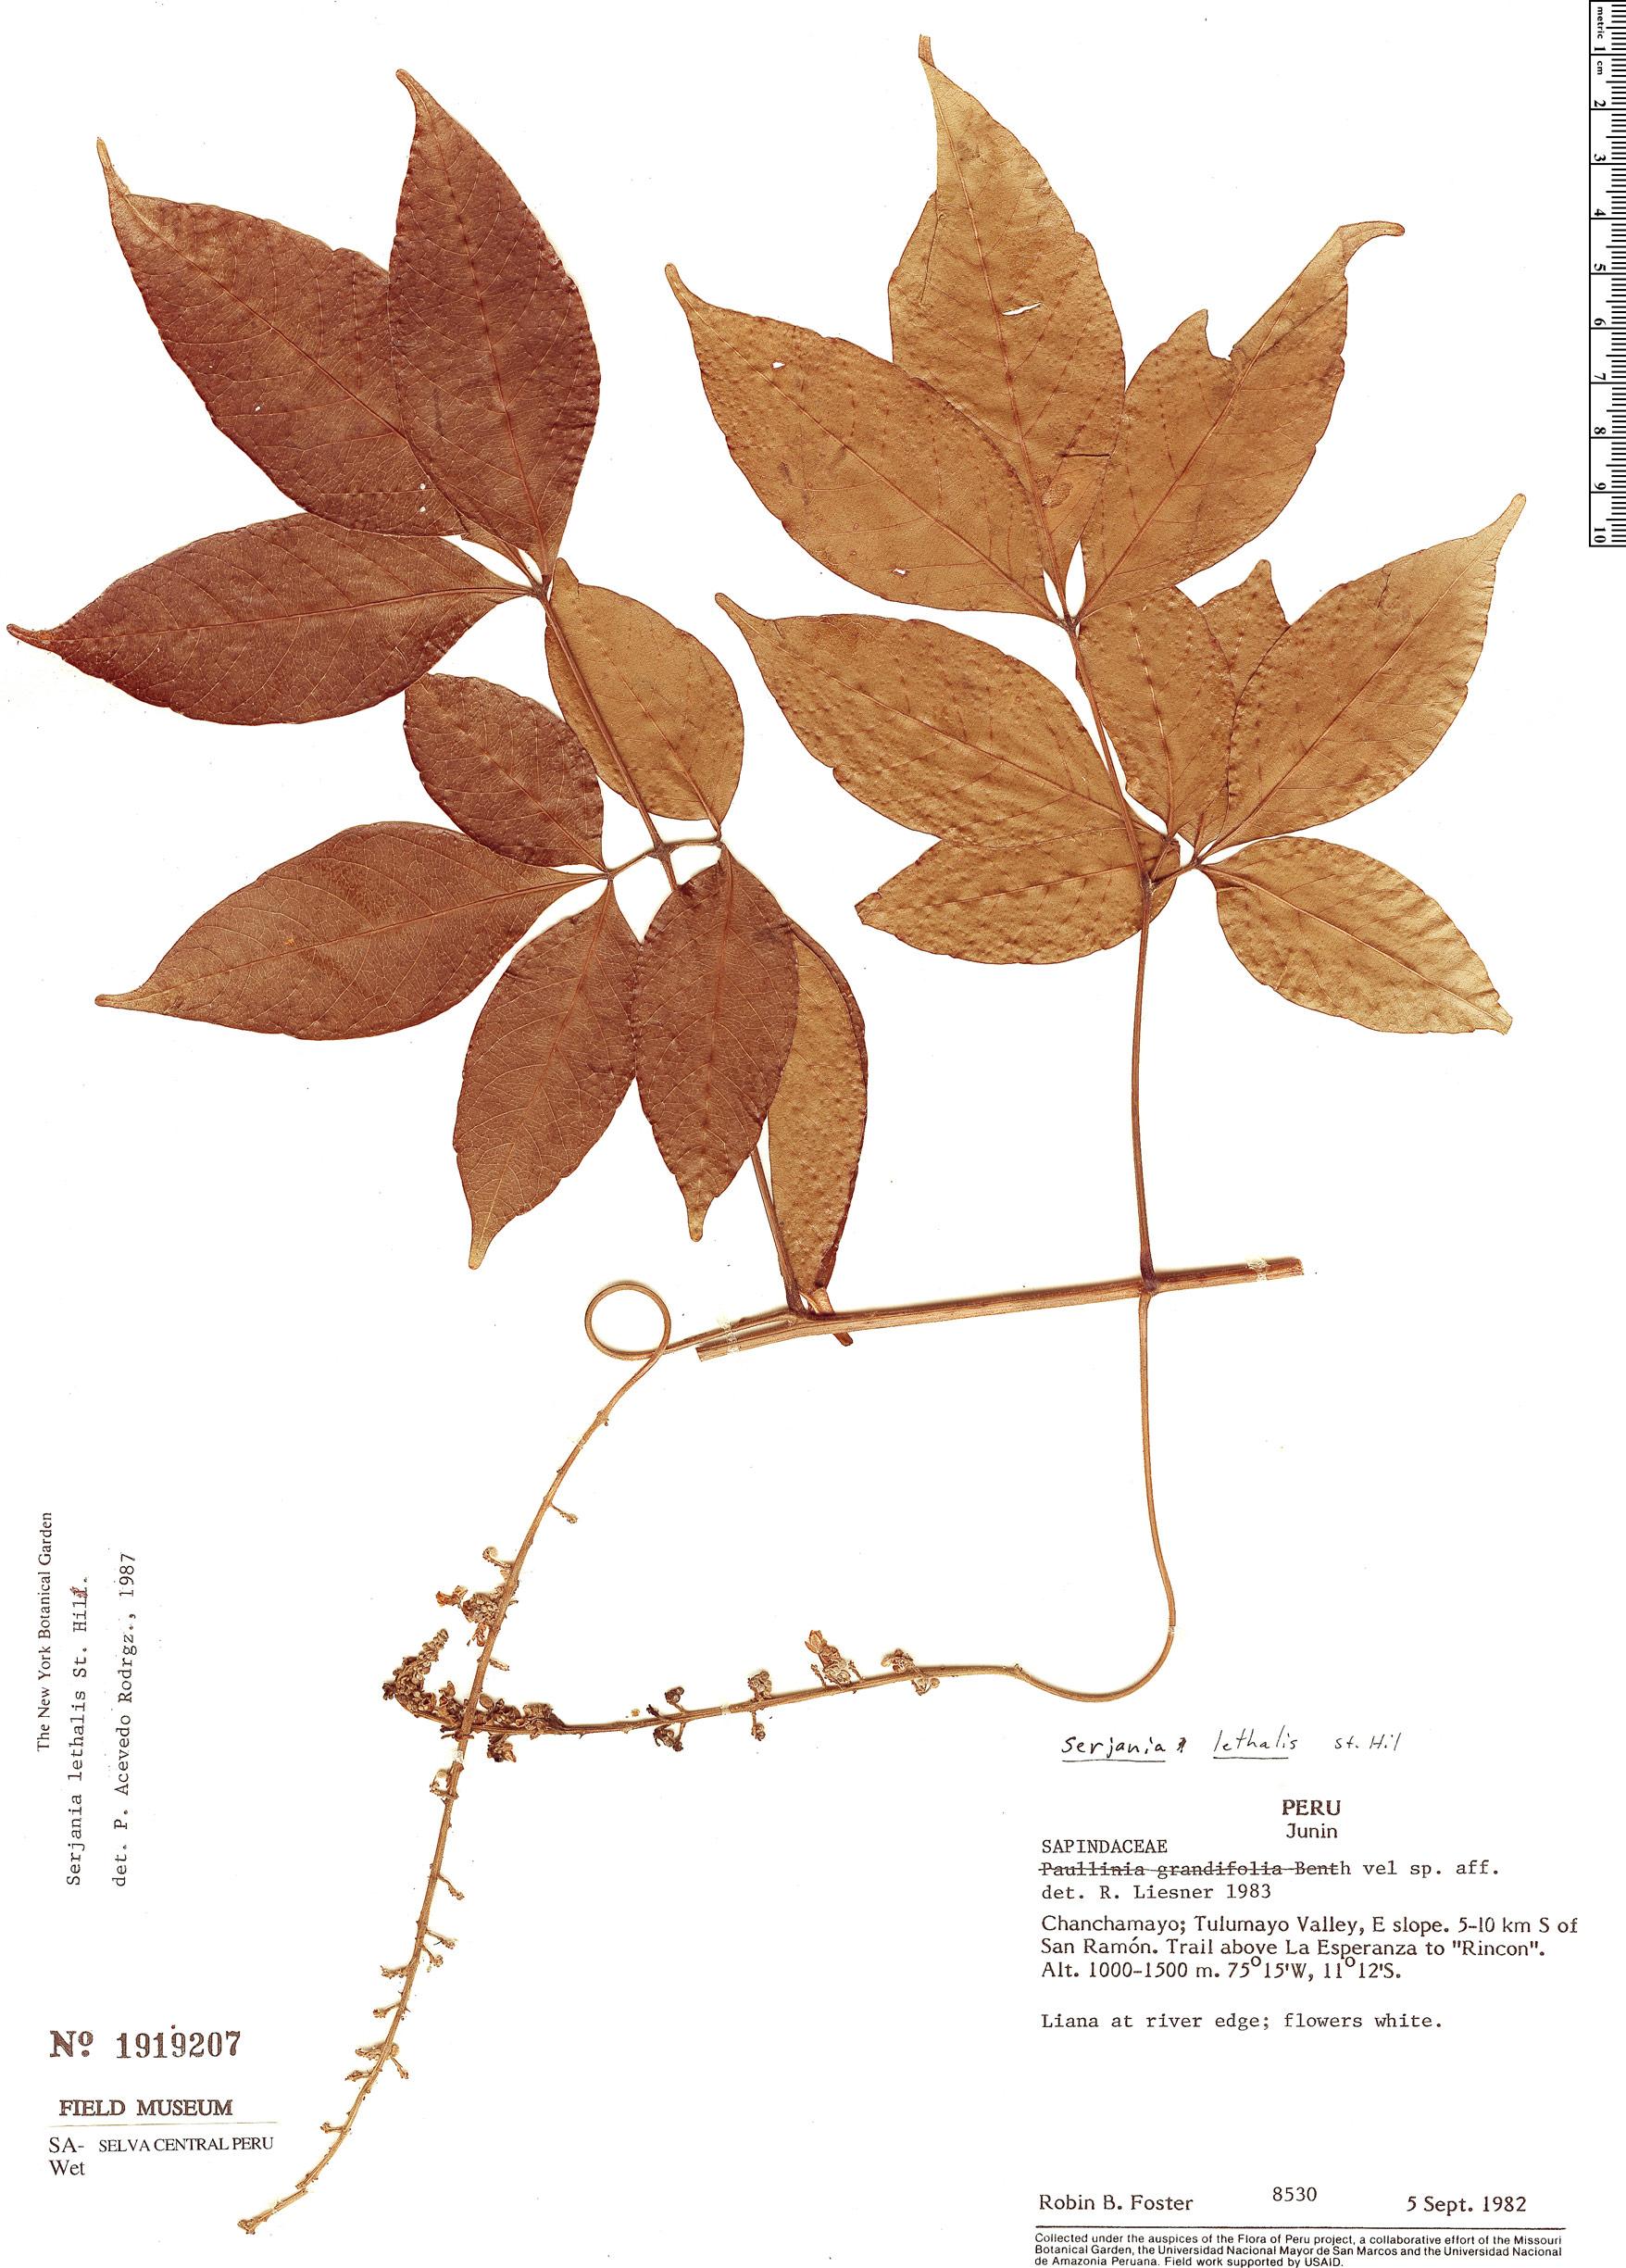 Specimen: Serjania lethalis